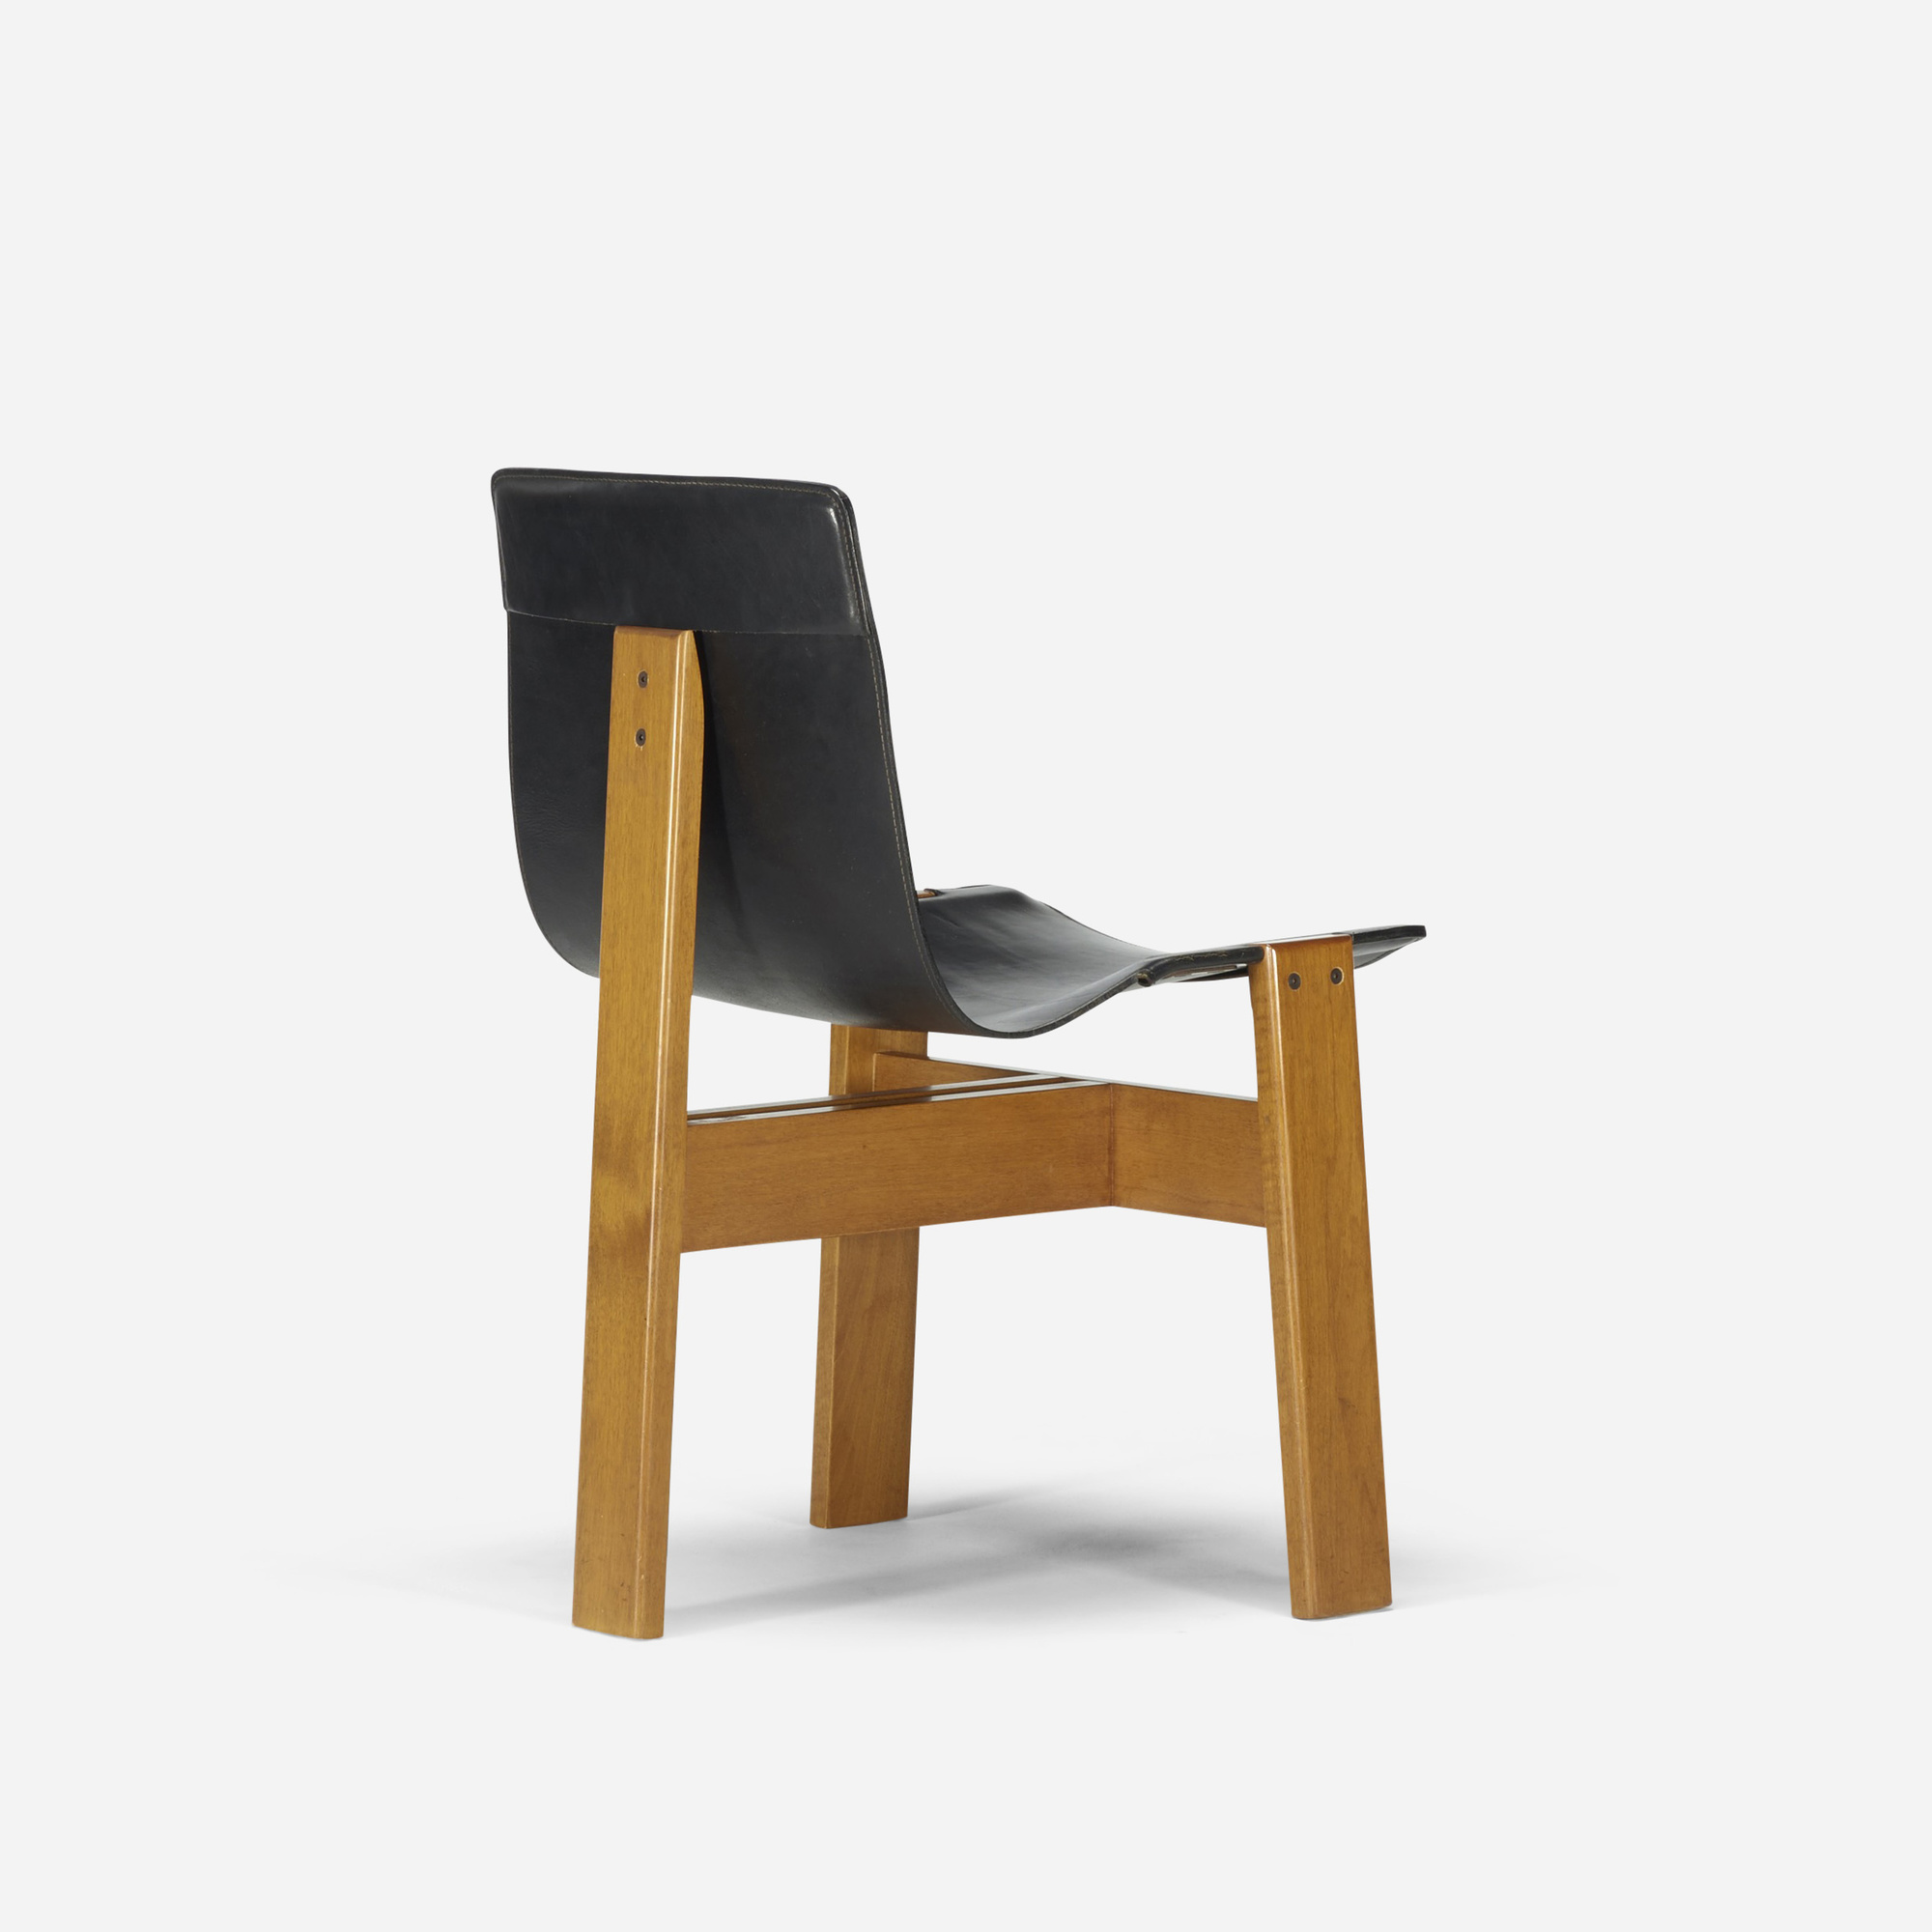 526: Angelo Mangiarotti / Tre 3 dining chair (1 of 3)